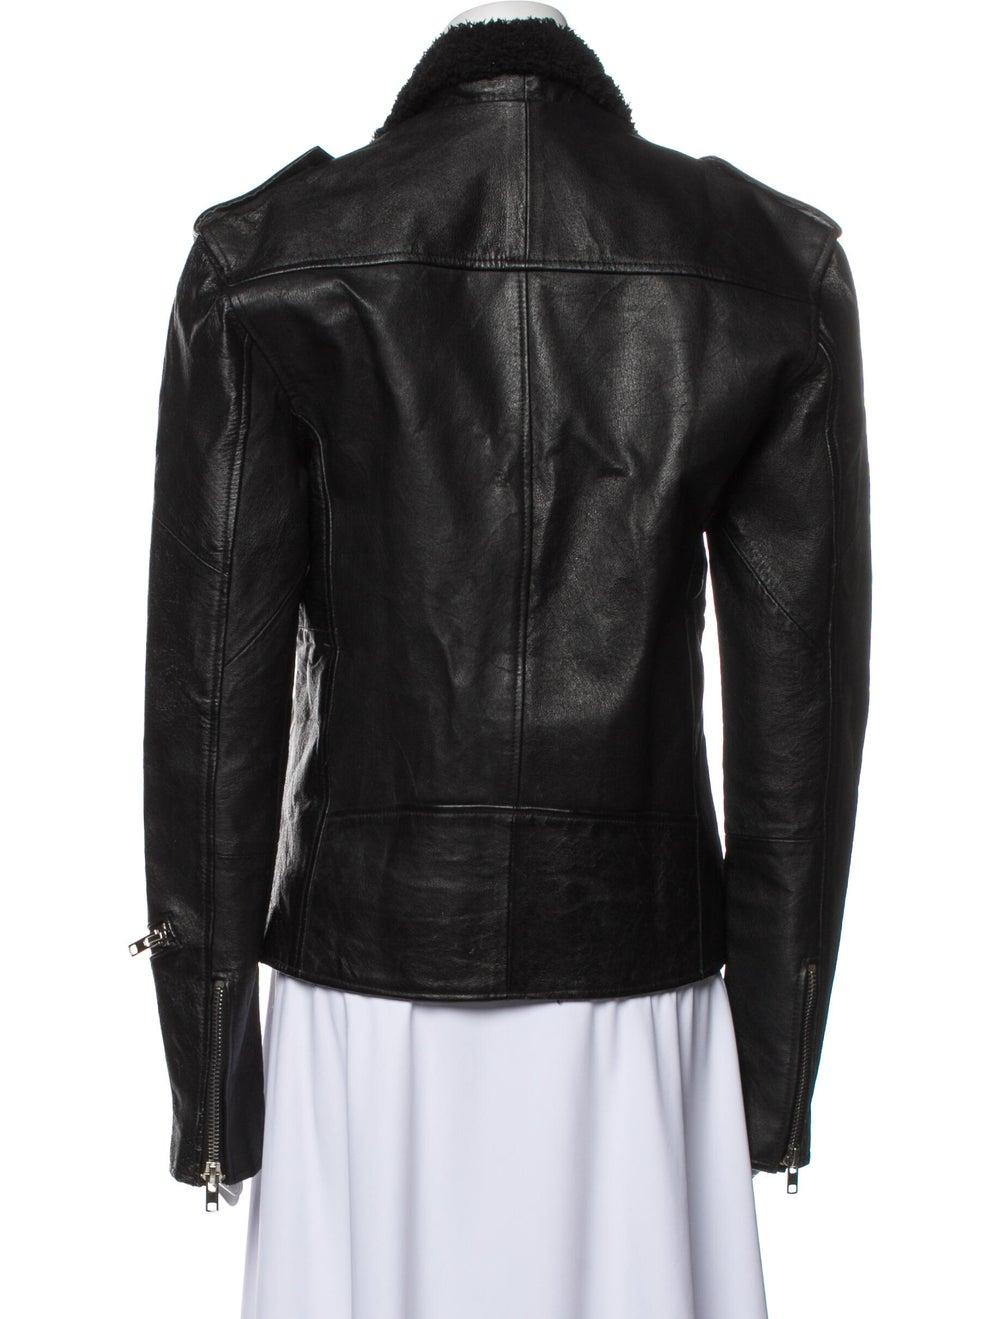 Deadwood Leather Biker Jacket Black - image 3